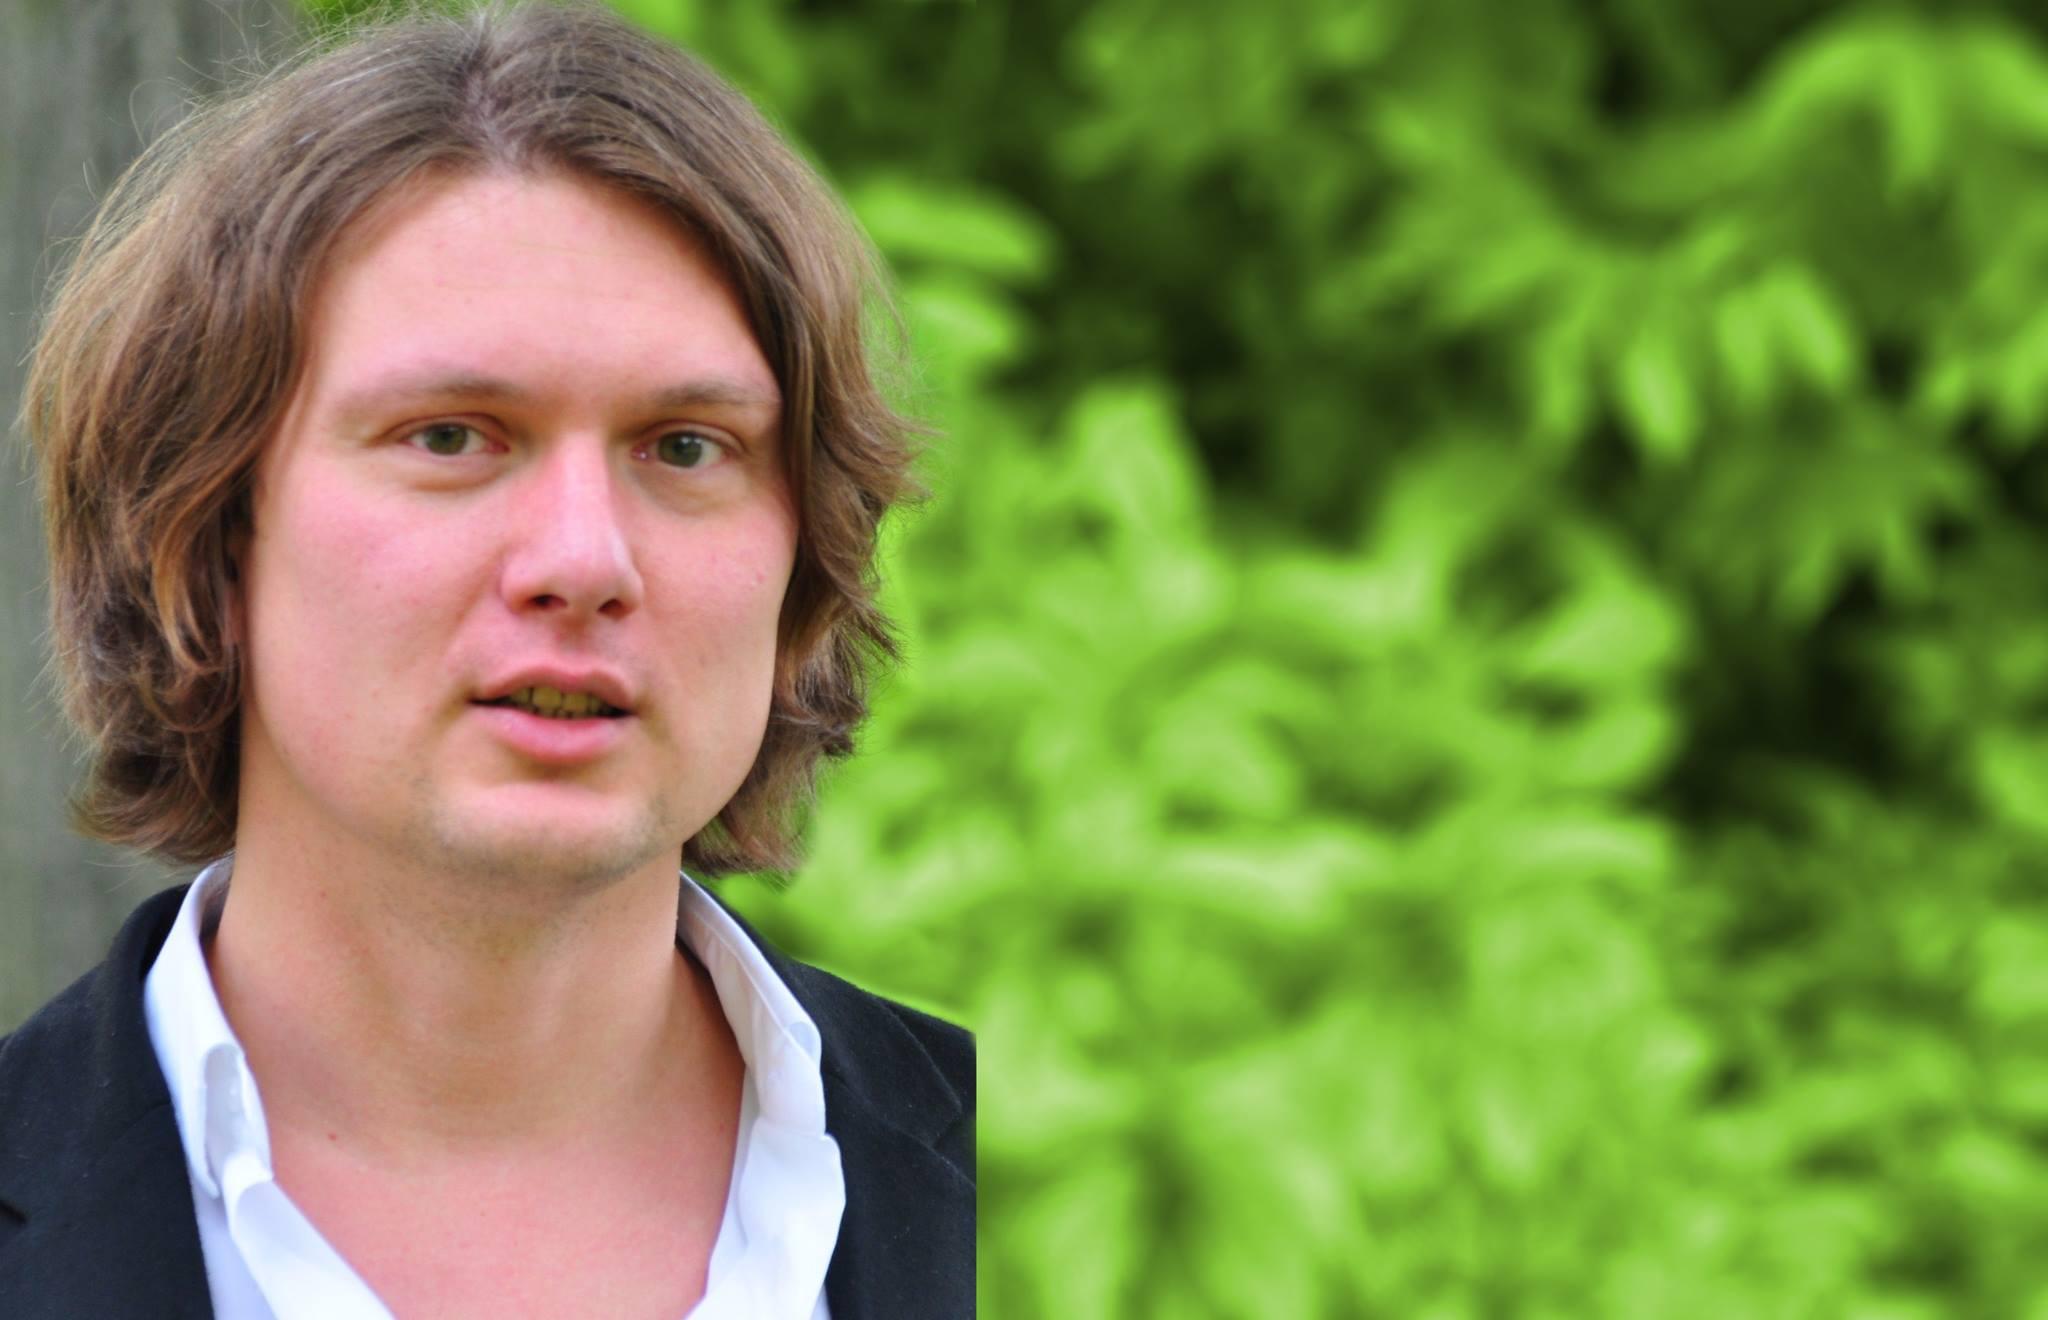 PD Dr. Mark Schweda